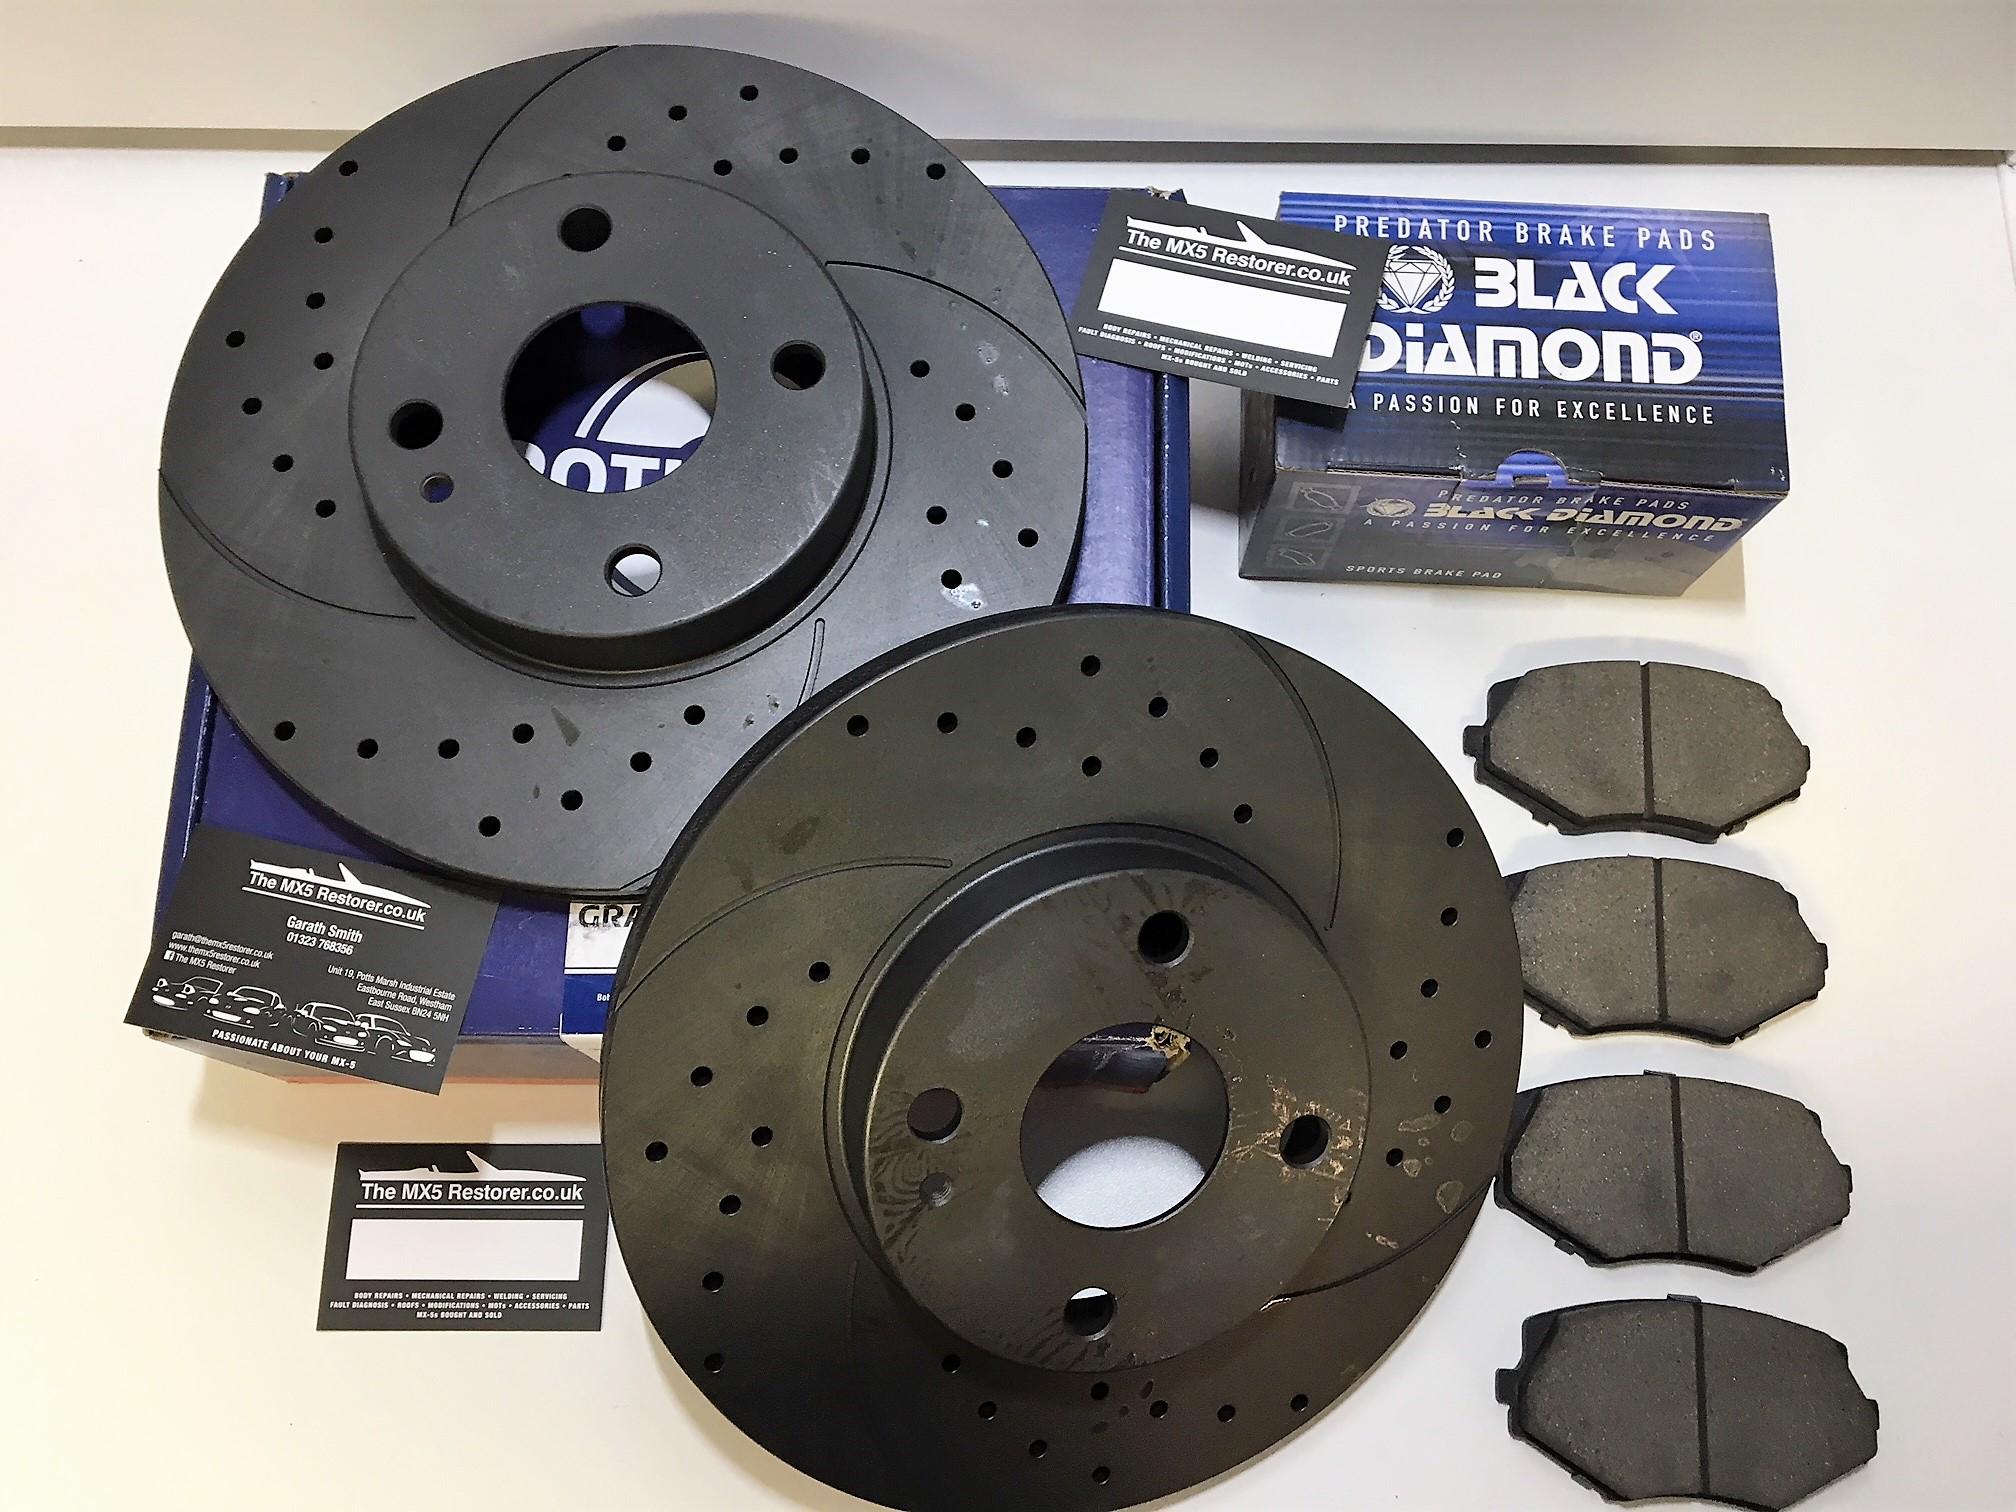 Mk2 5 1 6 1 8 Front Rotinger Brake Discs With Black Diamond Pads